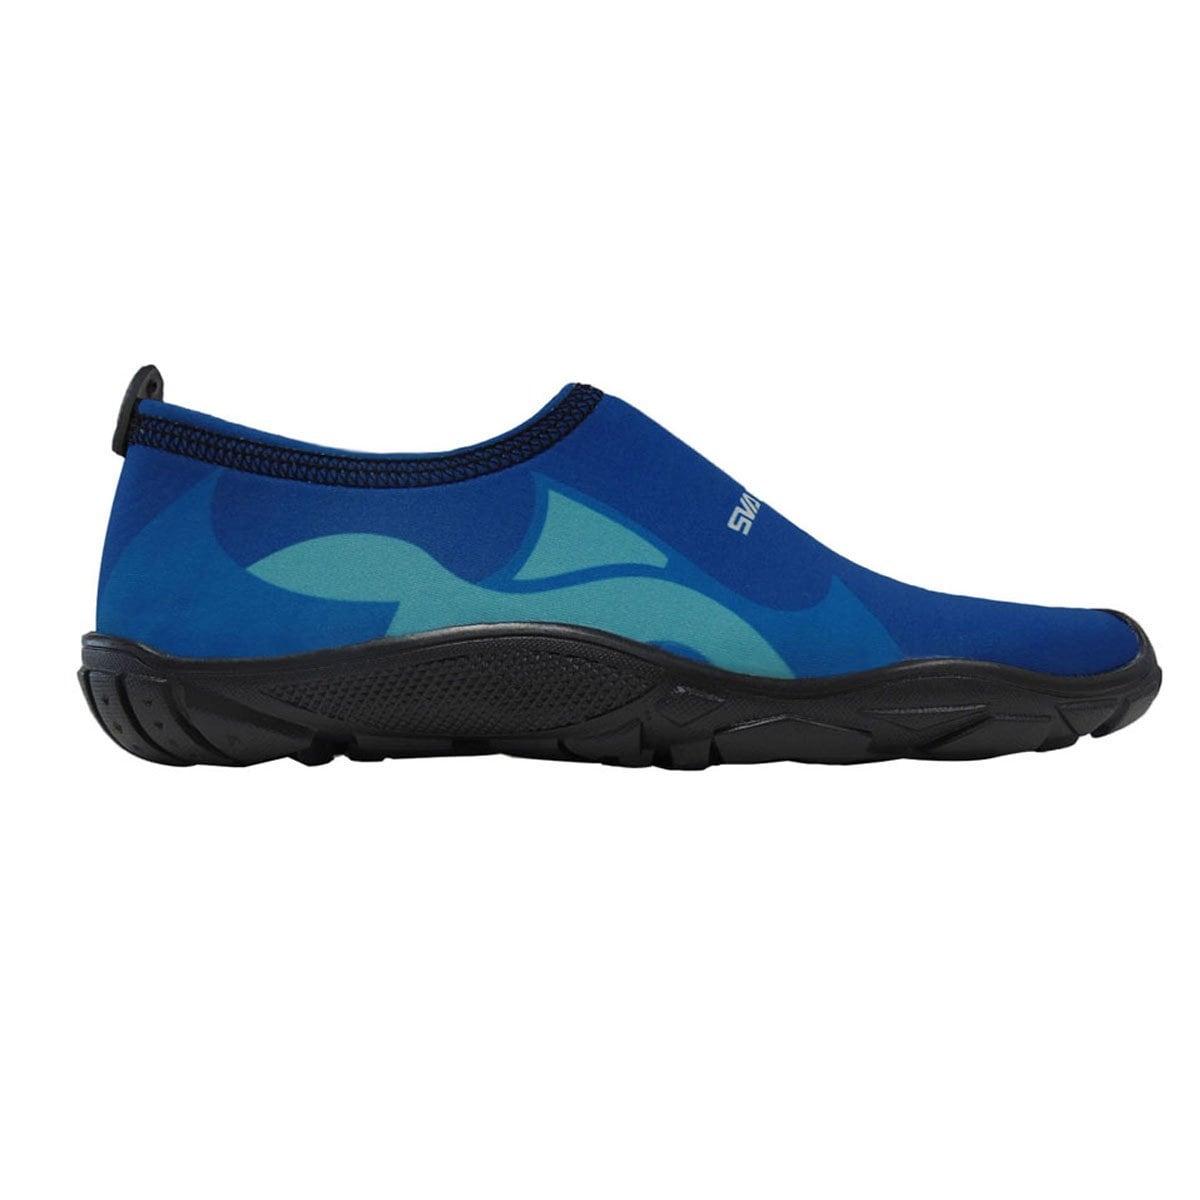 Zapato Acuático Tiburón Azul Svago - Infantil